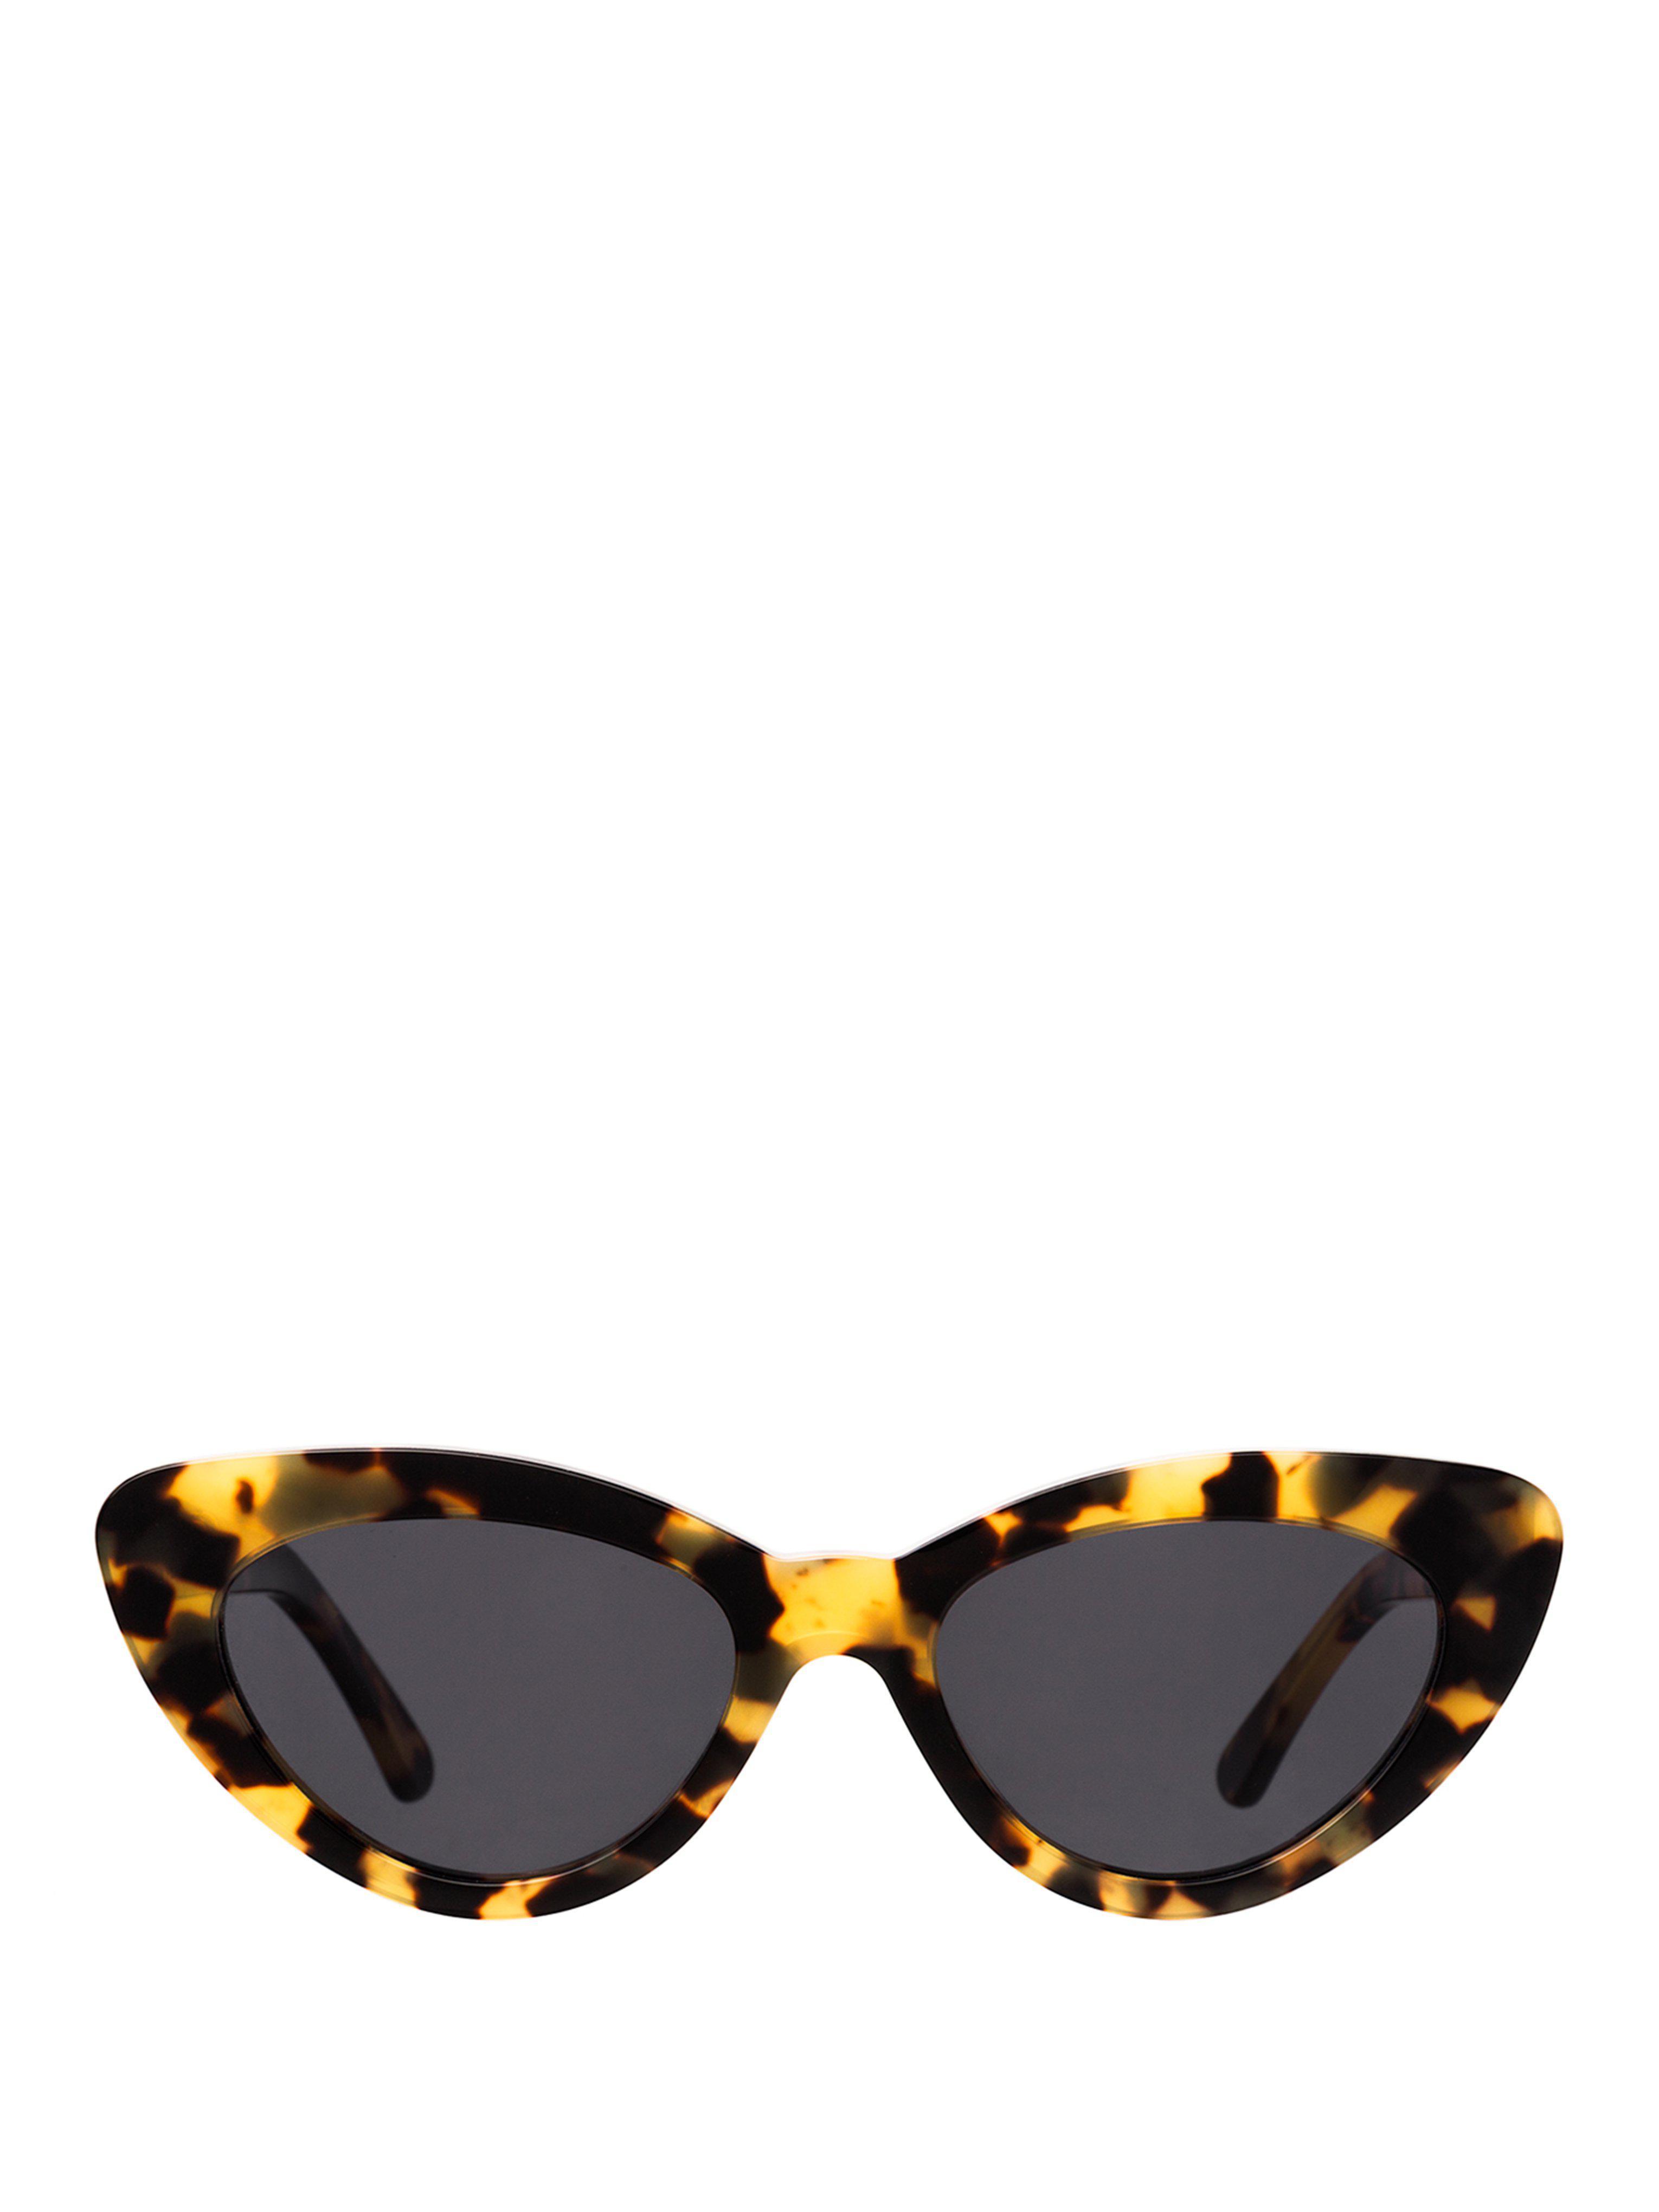 2377a66ee3 Illesteva - Blue Pamela Tortoise Sunglasses - Lyst. View fullscreen